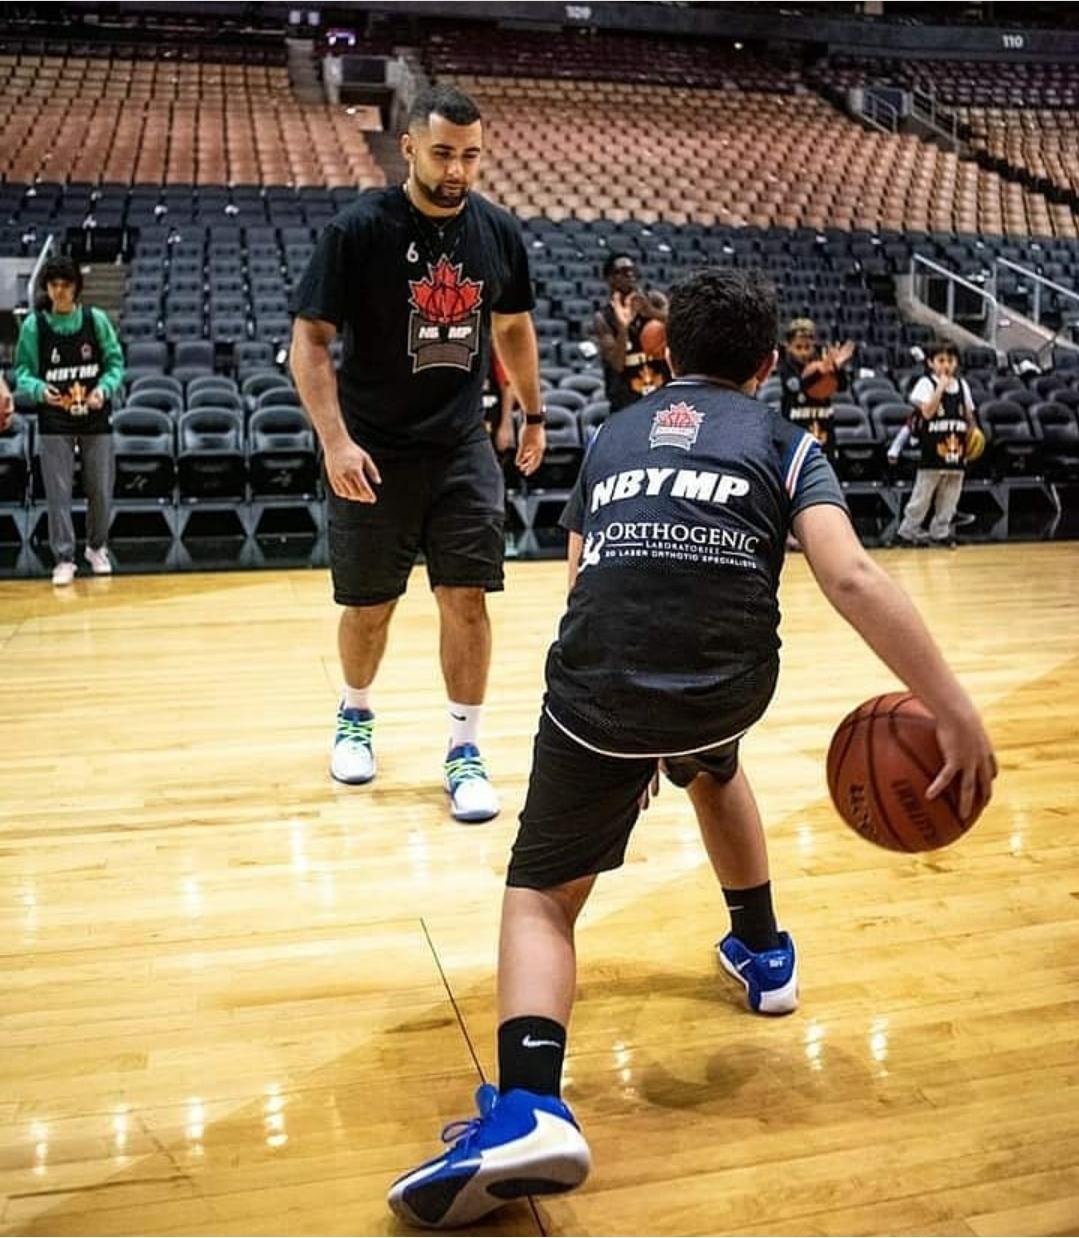 Jamil Abiad playing basketball